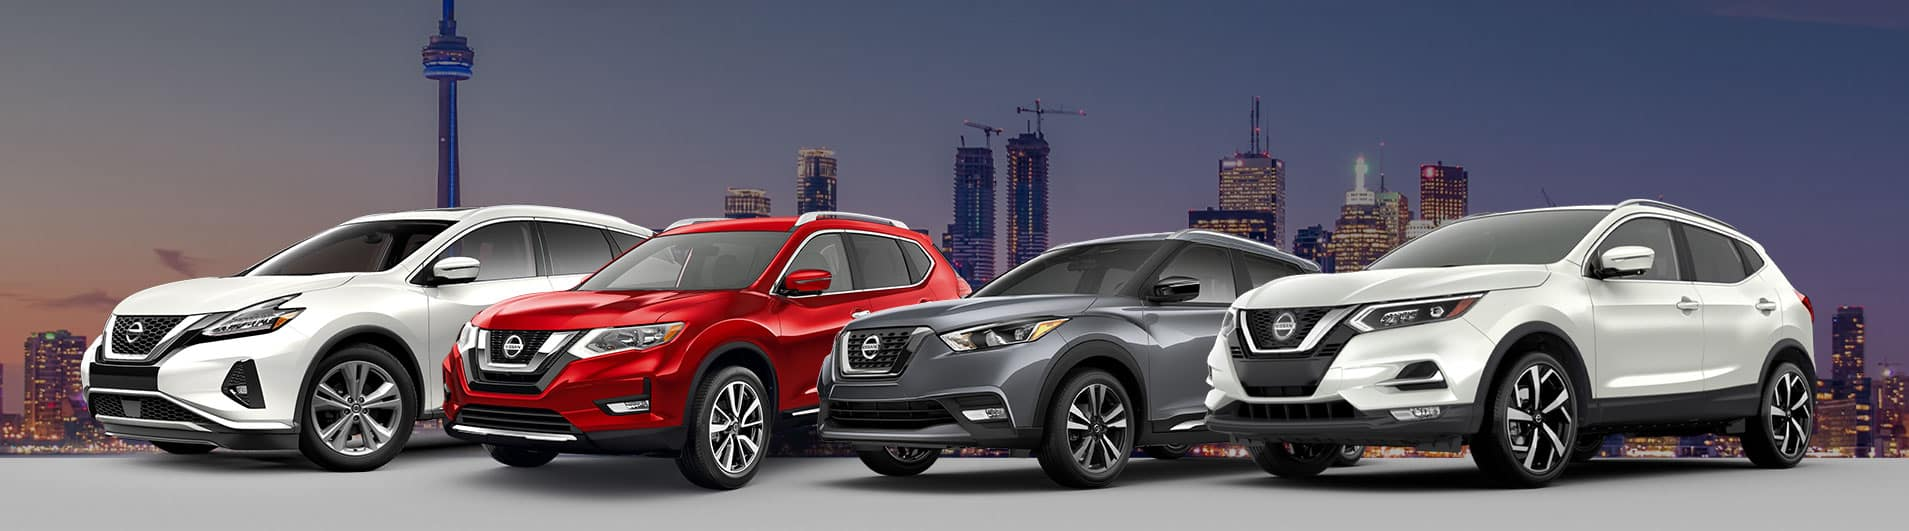 2021 and 2020 Nissan vehicles at Ajax Nissan